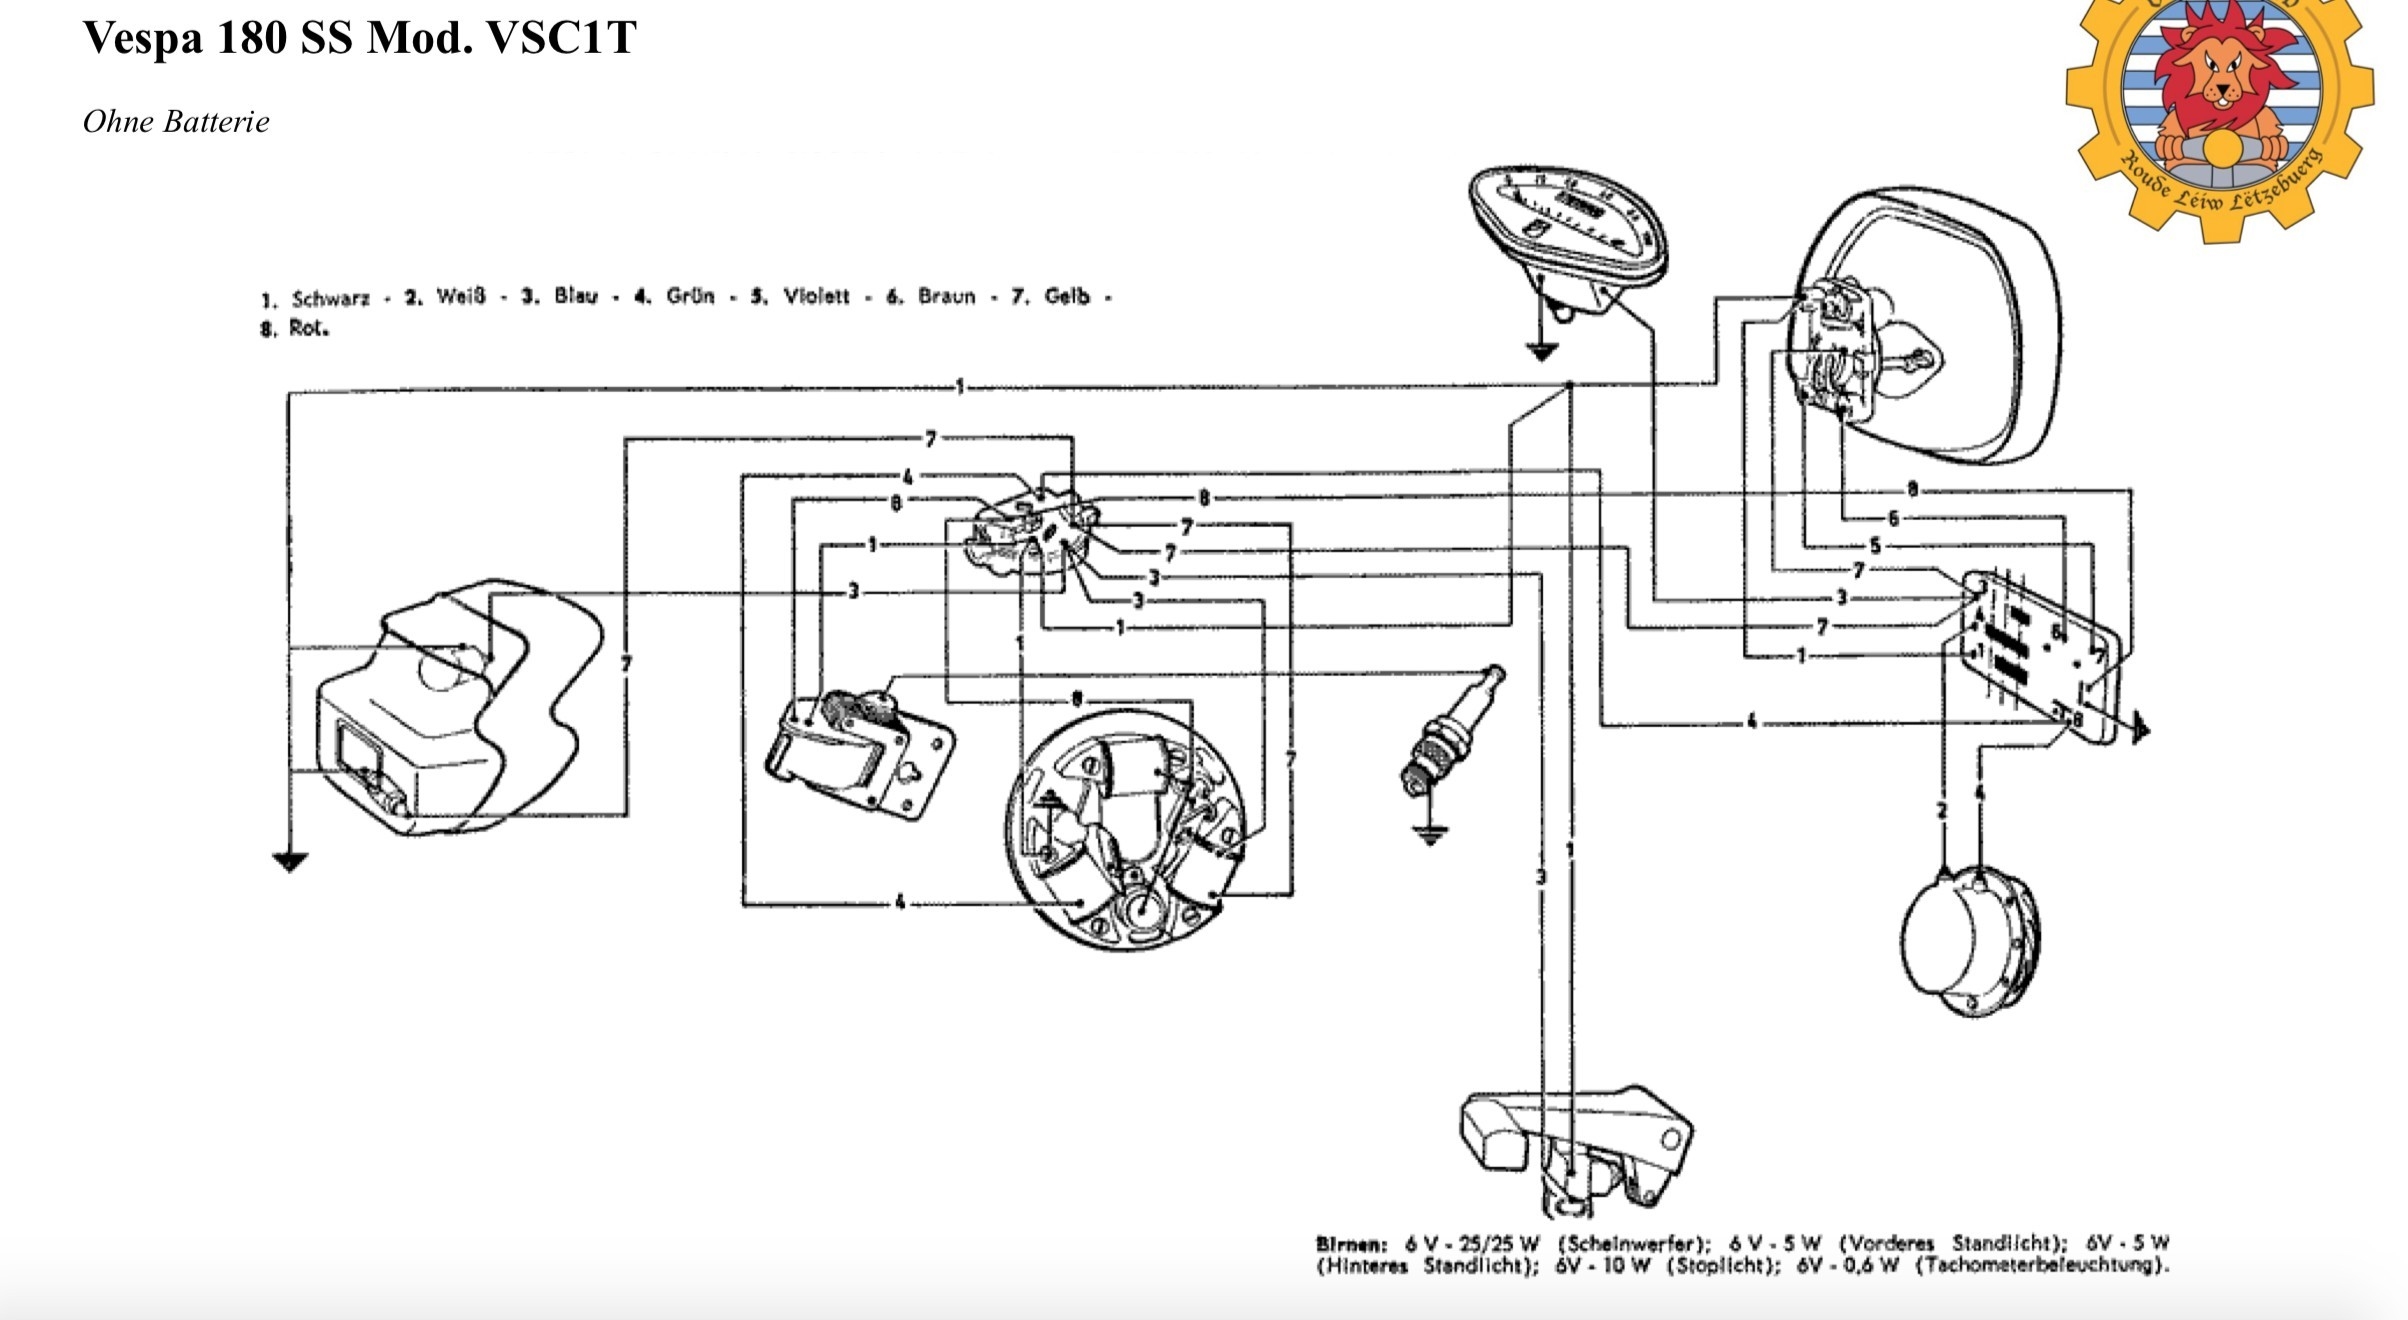 1997 toyota Corolla Engine Diagram 2002 toyota Corolla Engine Diagram File 1997 toyota Corolla Ae101r Of 1997 toyota Corolla Engine Diagram